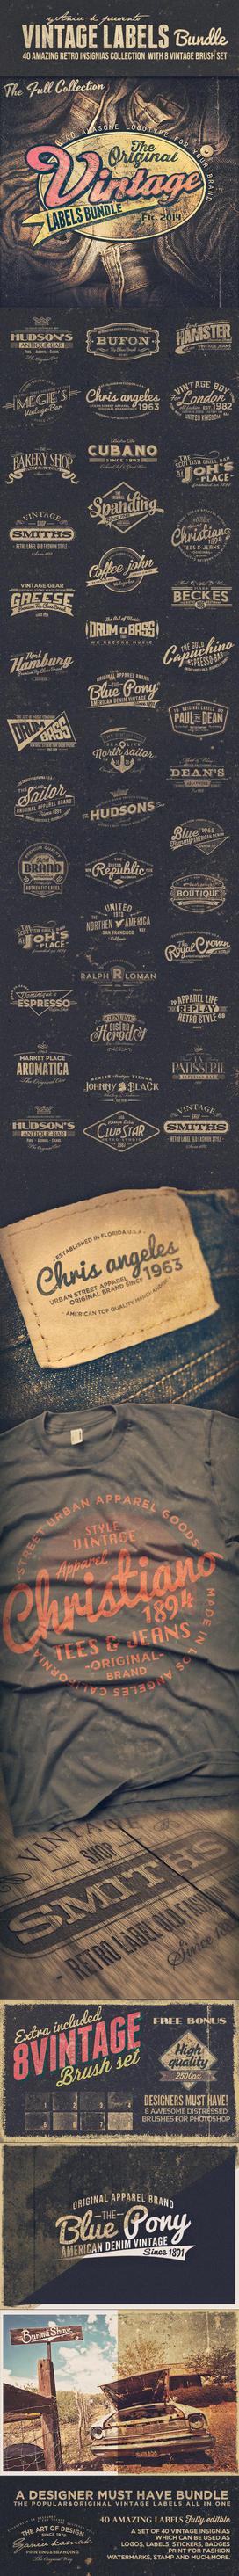 Vintage Labels PSD Insignias Badges Logo Pack by yAniv-k